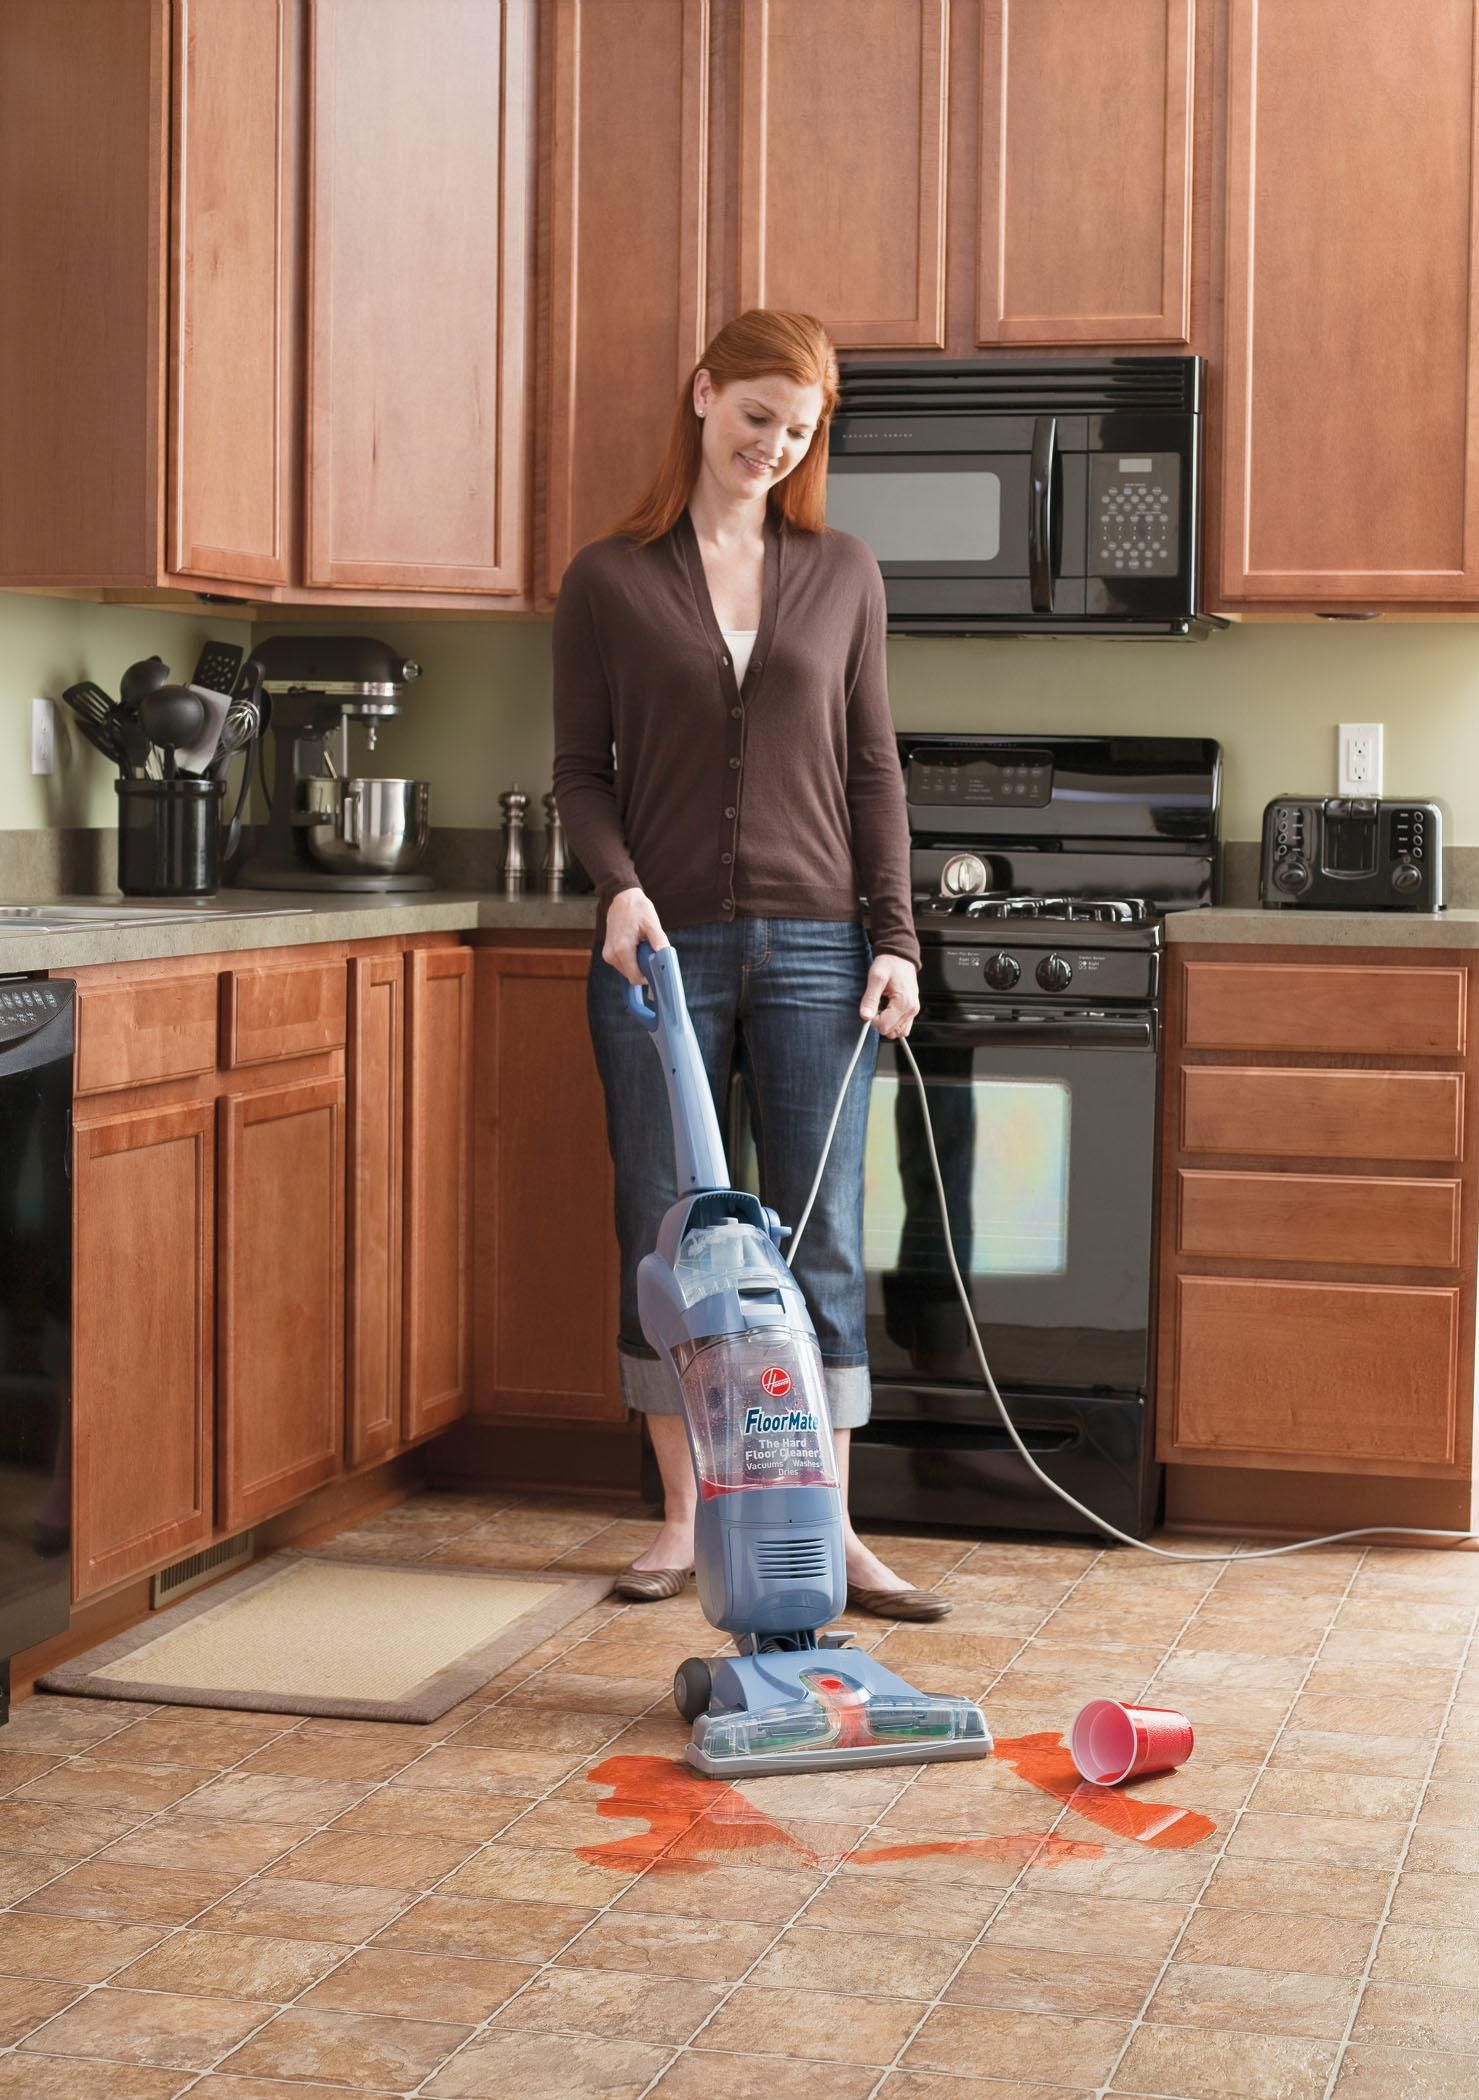 Hoover Hardwood Floor Cleaner Floormate Spinscrub With Bonus Hard Floor Wipes Corded Bare Floor Cleaner Fh40010b Floor Cleaner Wet Dry Vacuum Hoover Floormate